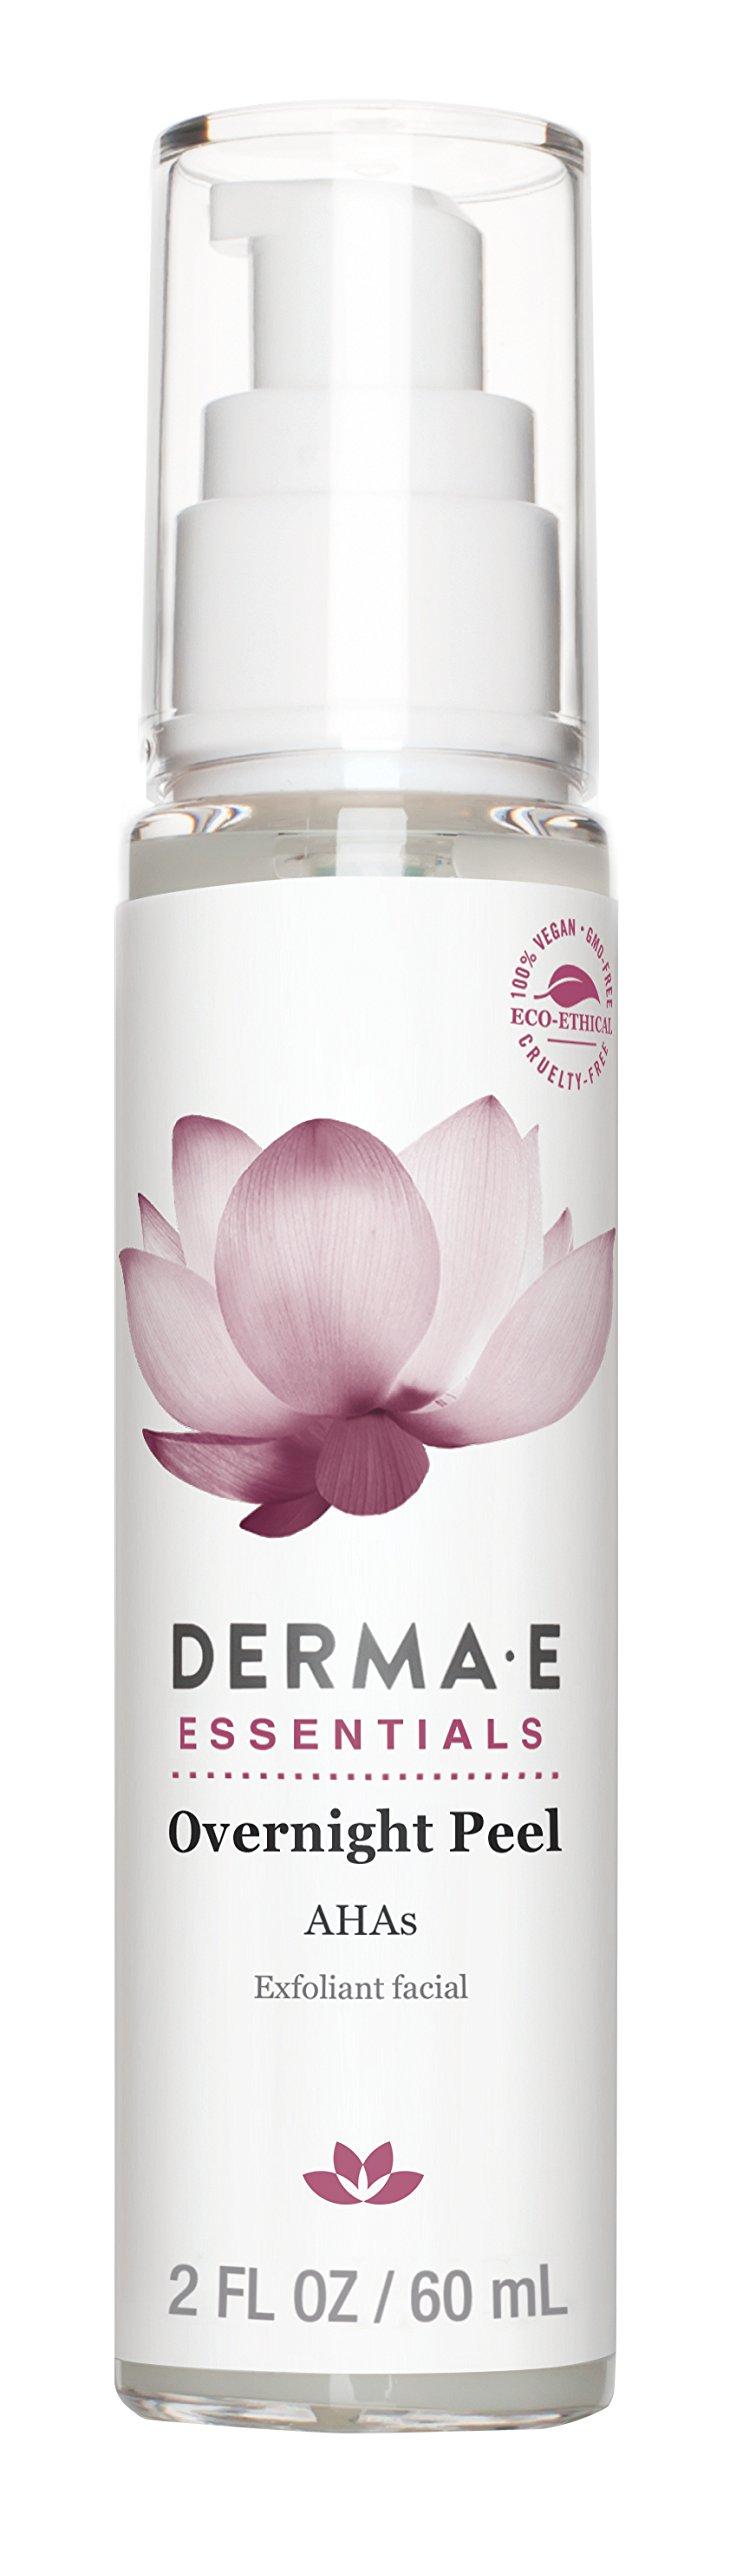 DERMA E Overnight Peel with Alpha Hydroxy Acids 2oz by DERMA-E (Image #2)